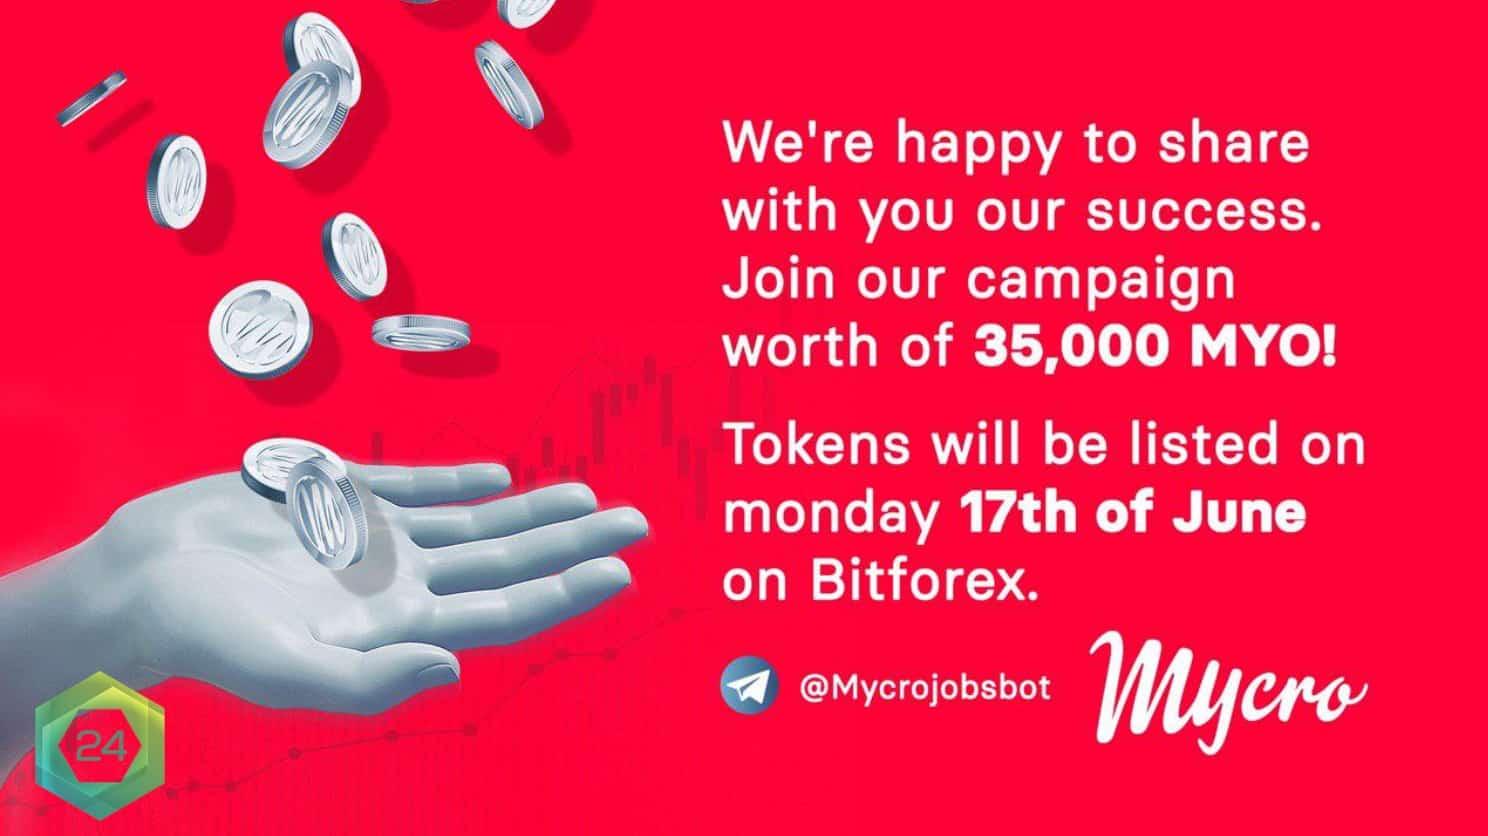 Mycro airdrop announcement